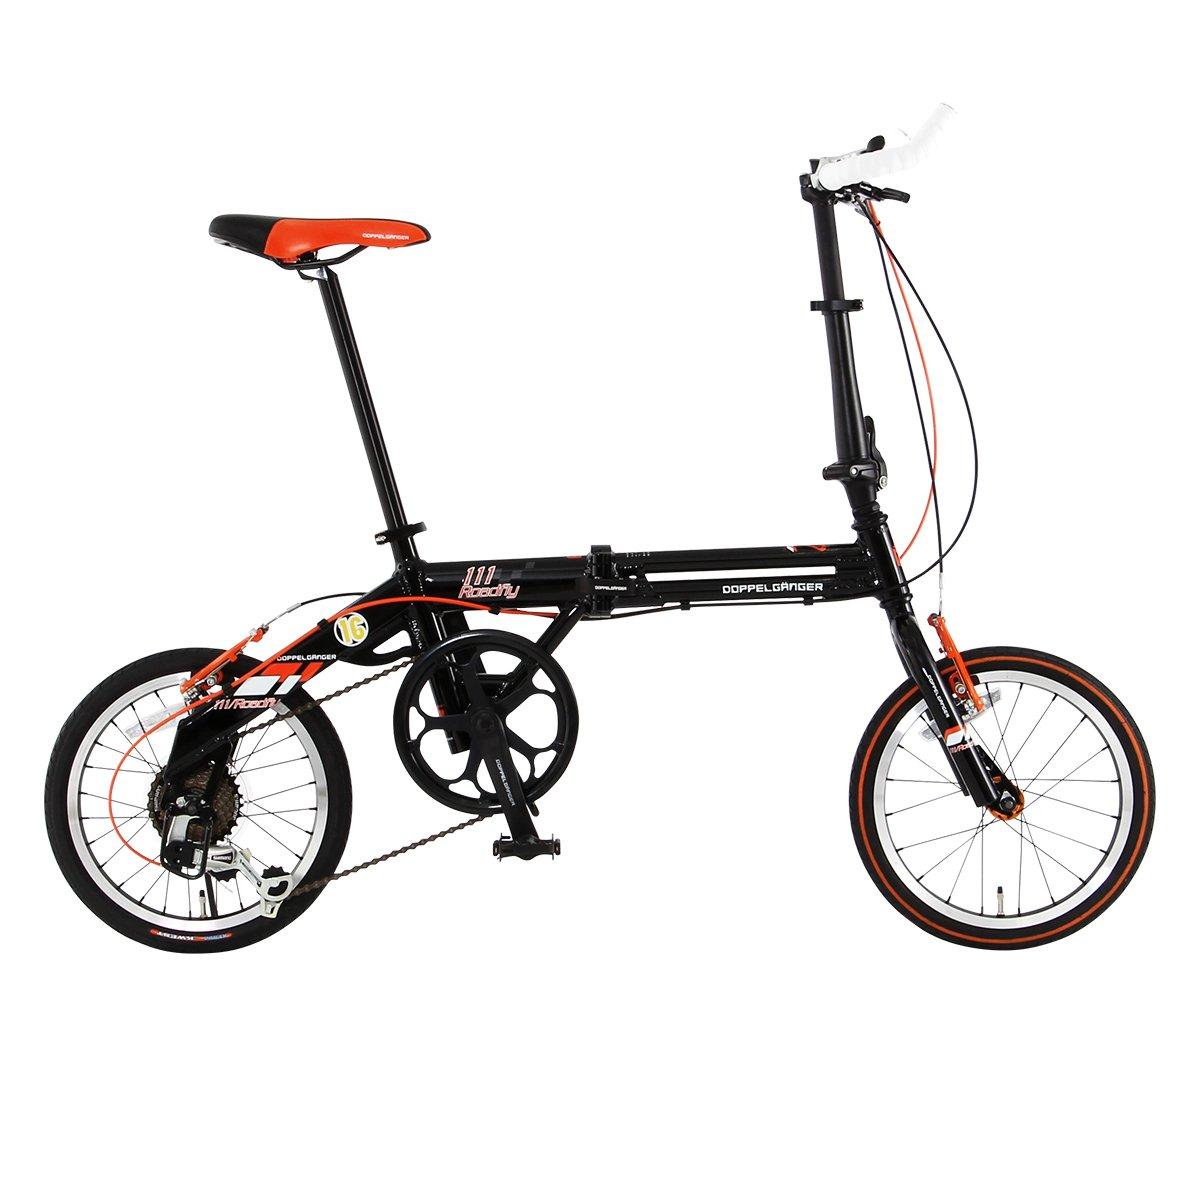 DOPPELGANGER(ドッペルギャンガー) 折りたたみ自転車 FALTRADシリーズ ROADFLY 111 16インチ 軽量アルミフレーム採用モデル B00C4PHTSU